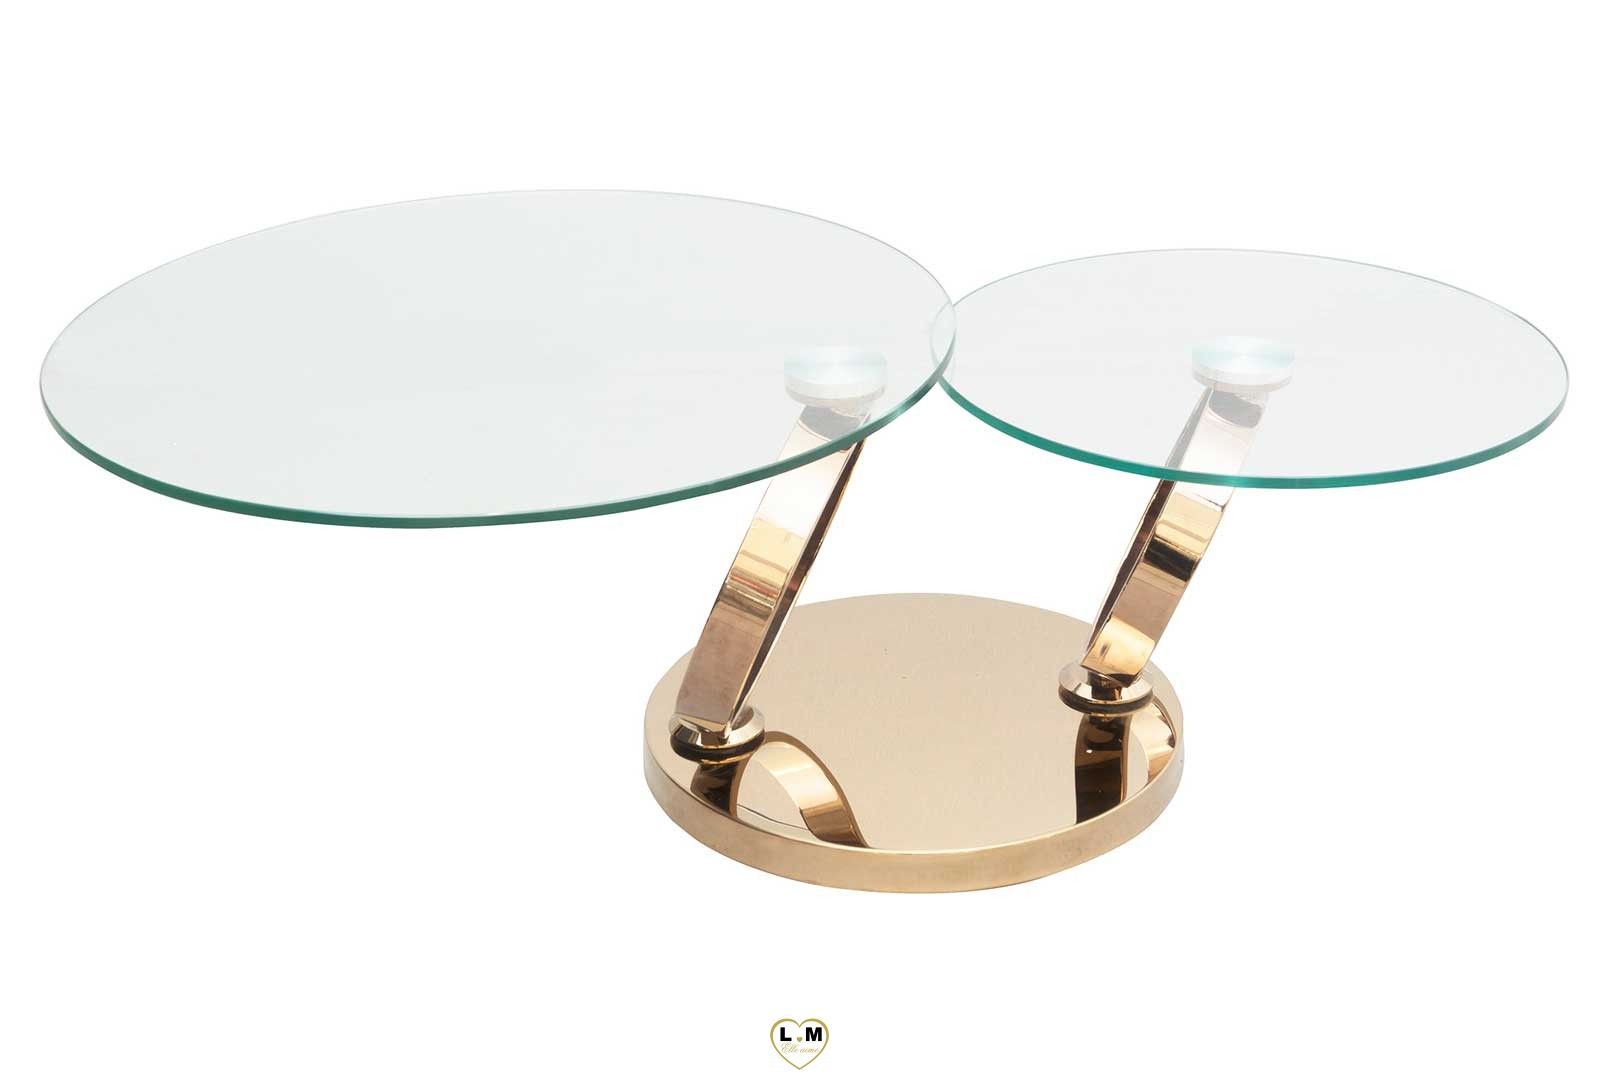 saint germain dore table basse verre articulee lignemeuble com. Black Bedroom Furniture Sets. Home Design Ideas